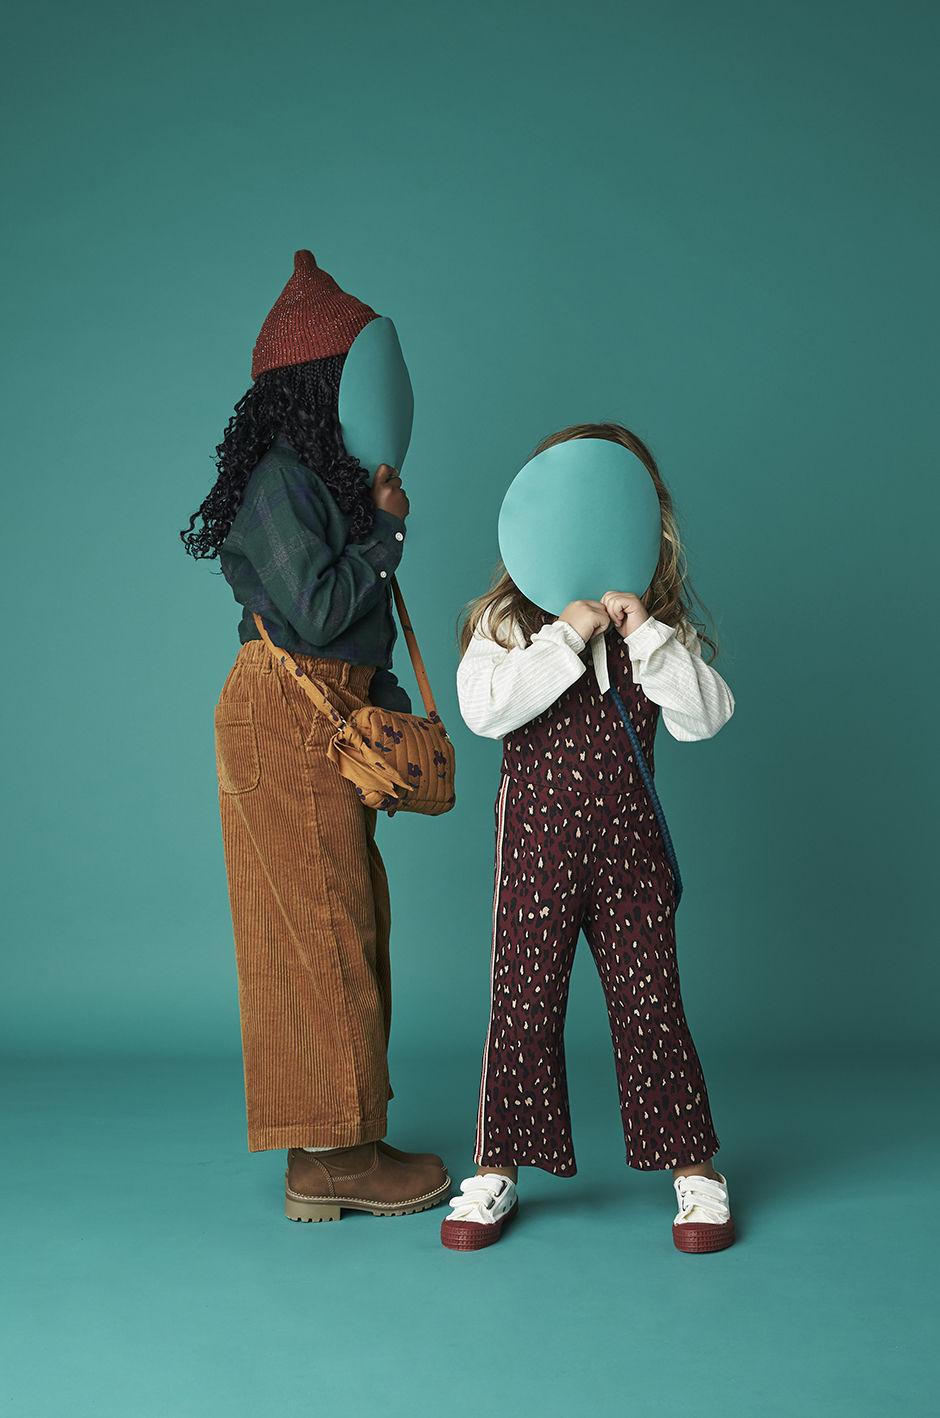 MIRIAM LINDTHALER C/O TOBIAS BOSCH FOTOMANAGEMENT FOTOGRAFIERT KID'S FASHION EDITORIAL 'FARBEN' FÜR ELTERN FAMILY